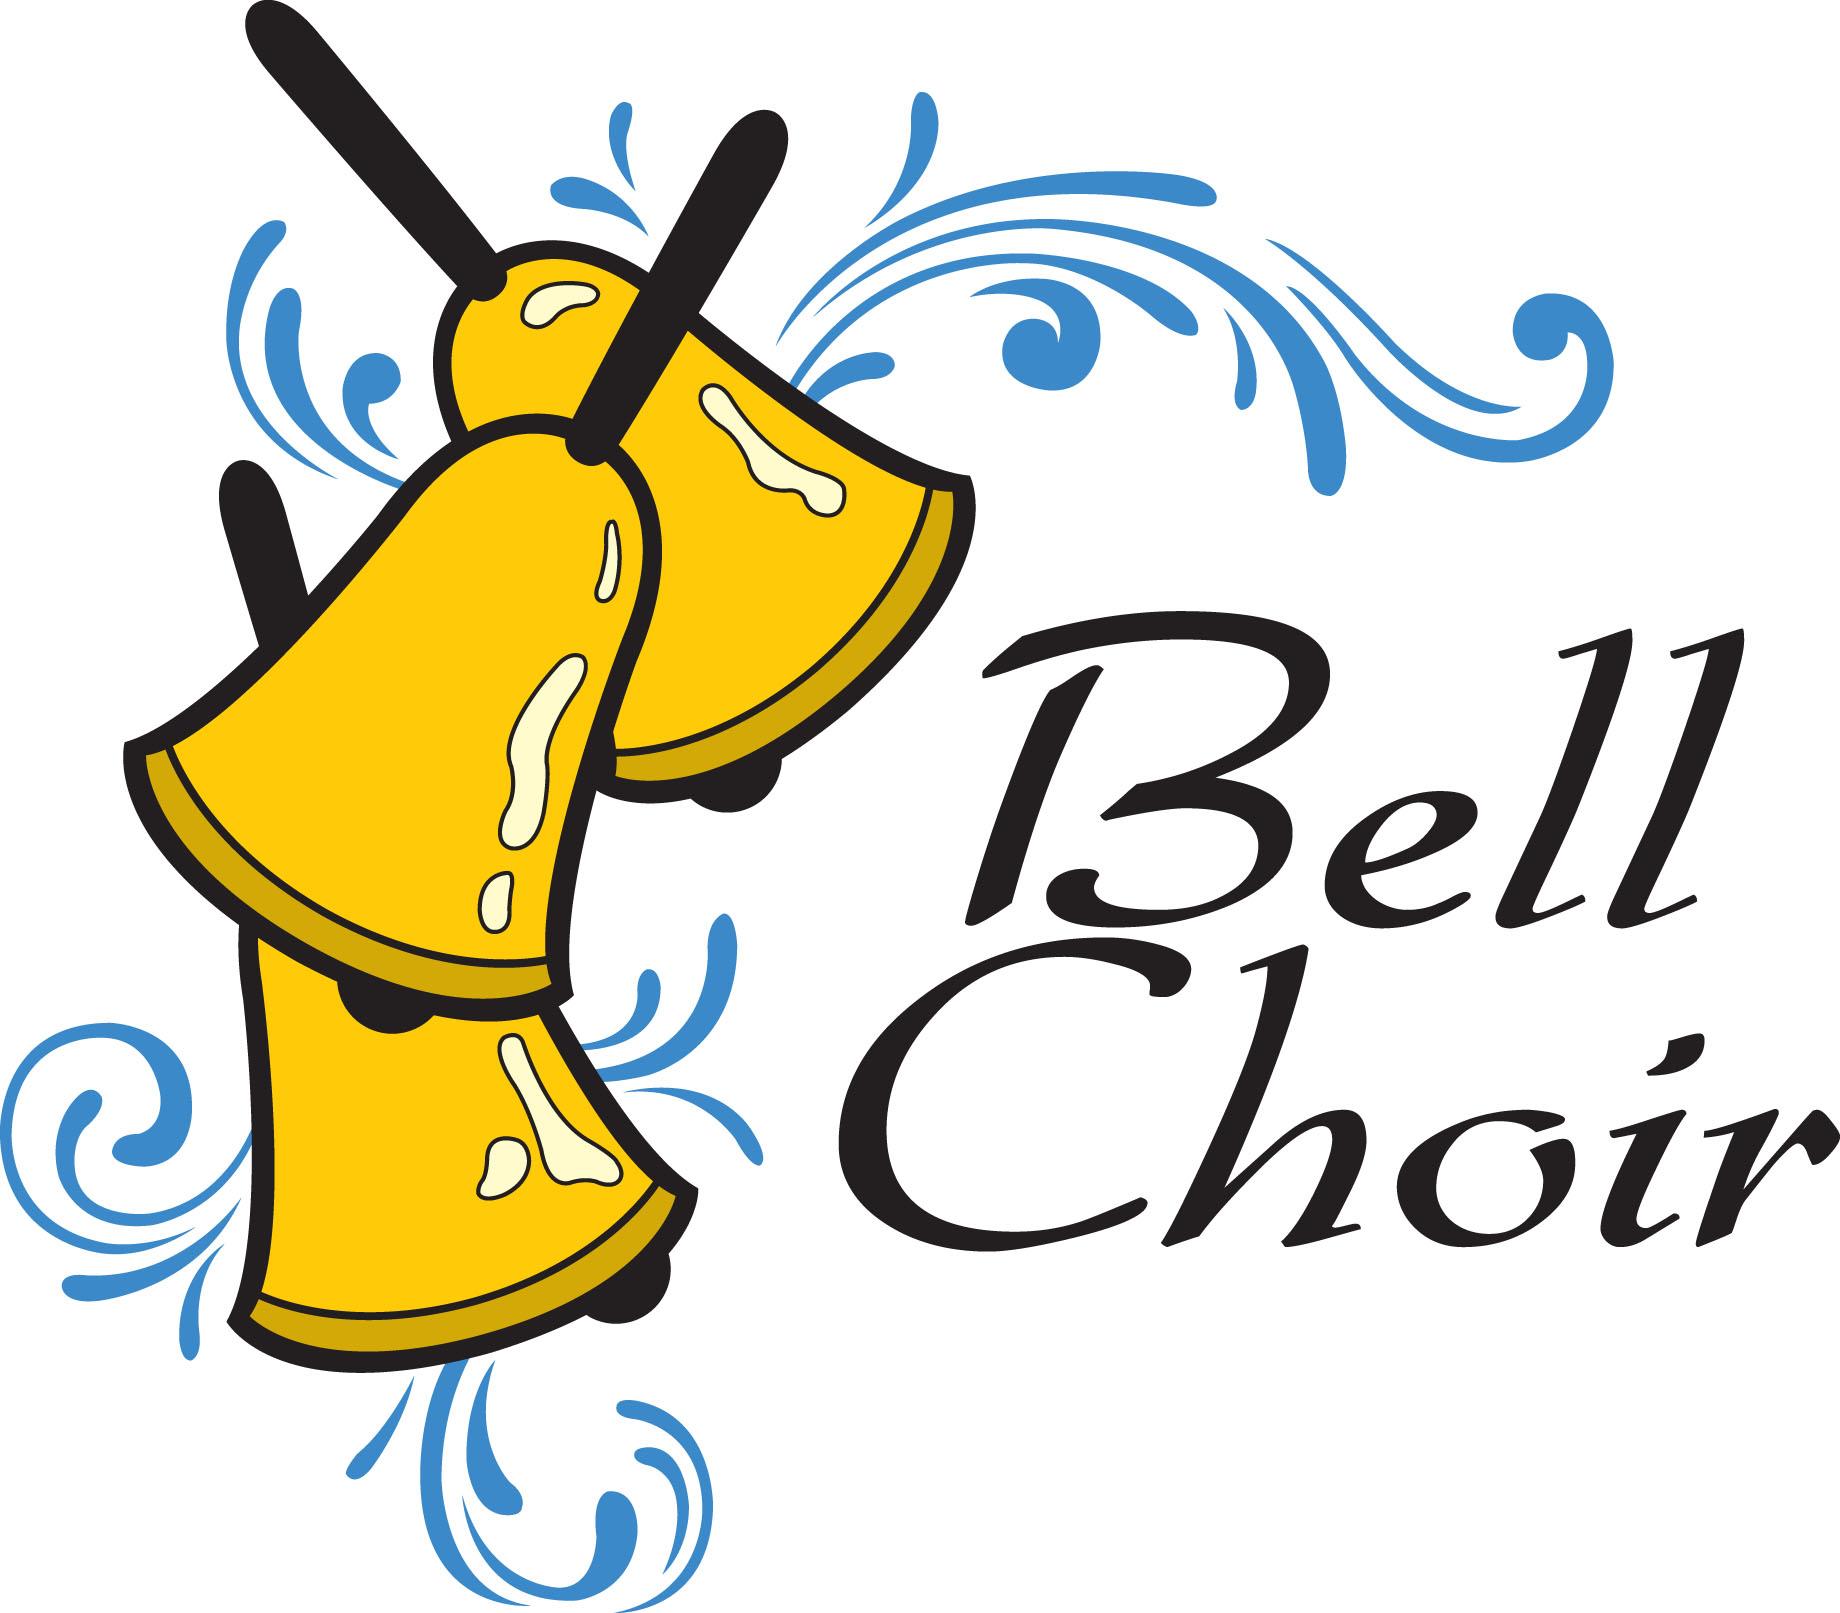 Choir clipart easter. Union baptist church music